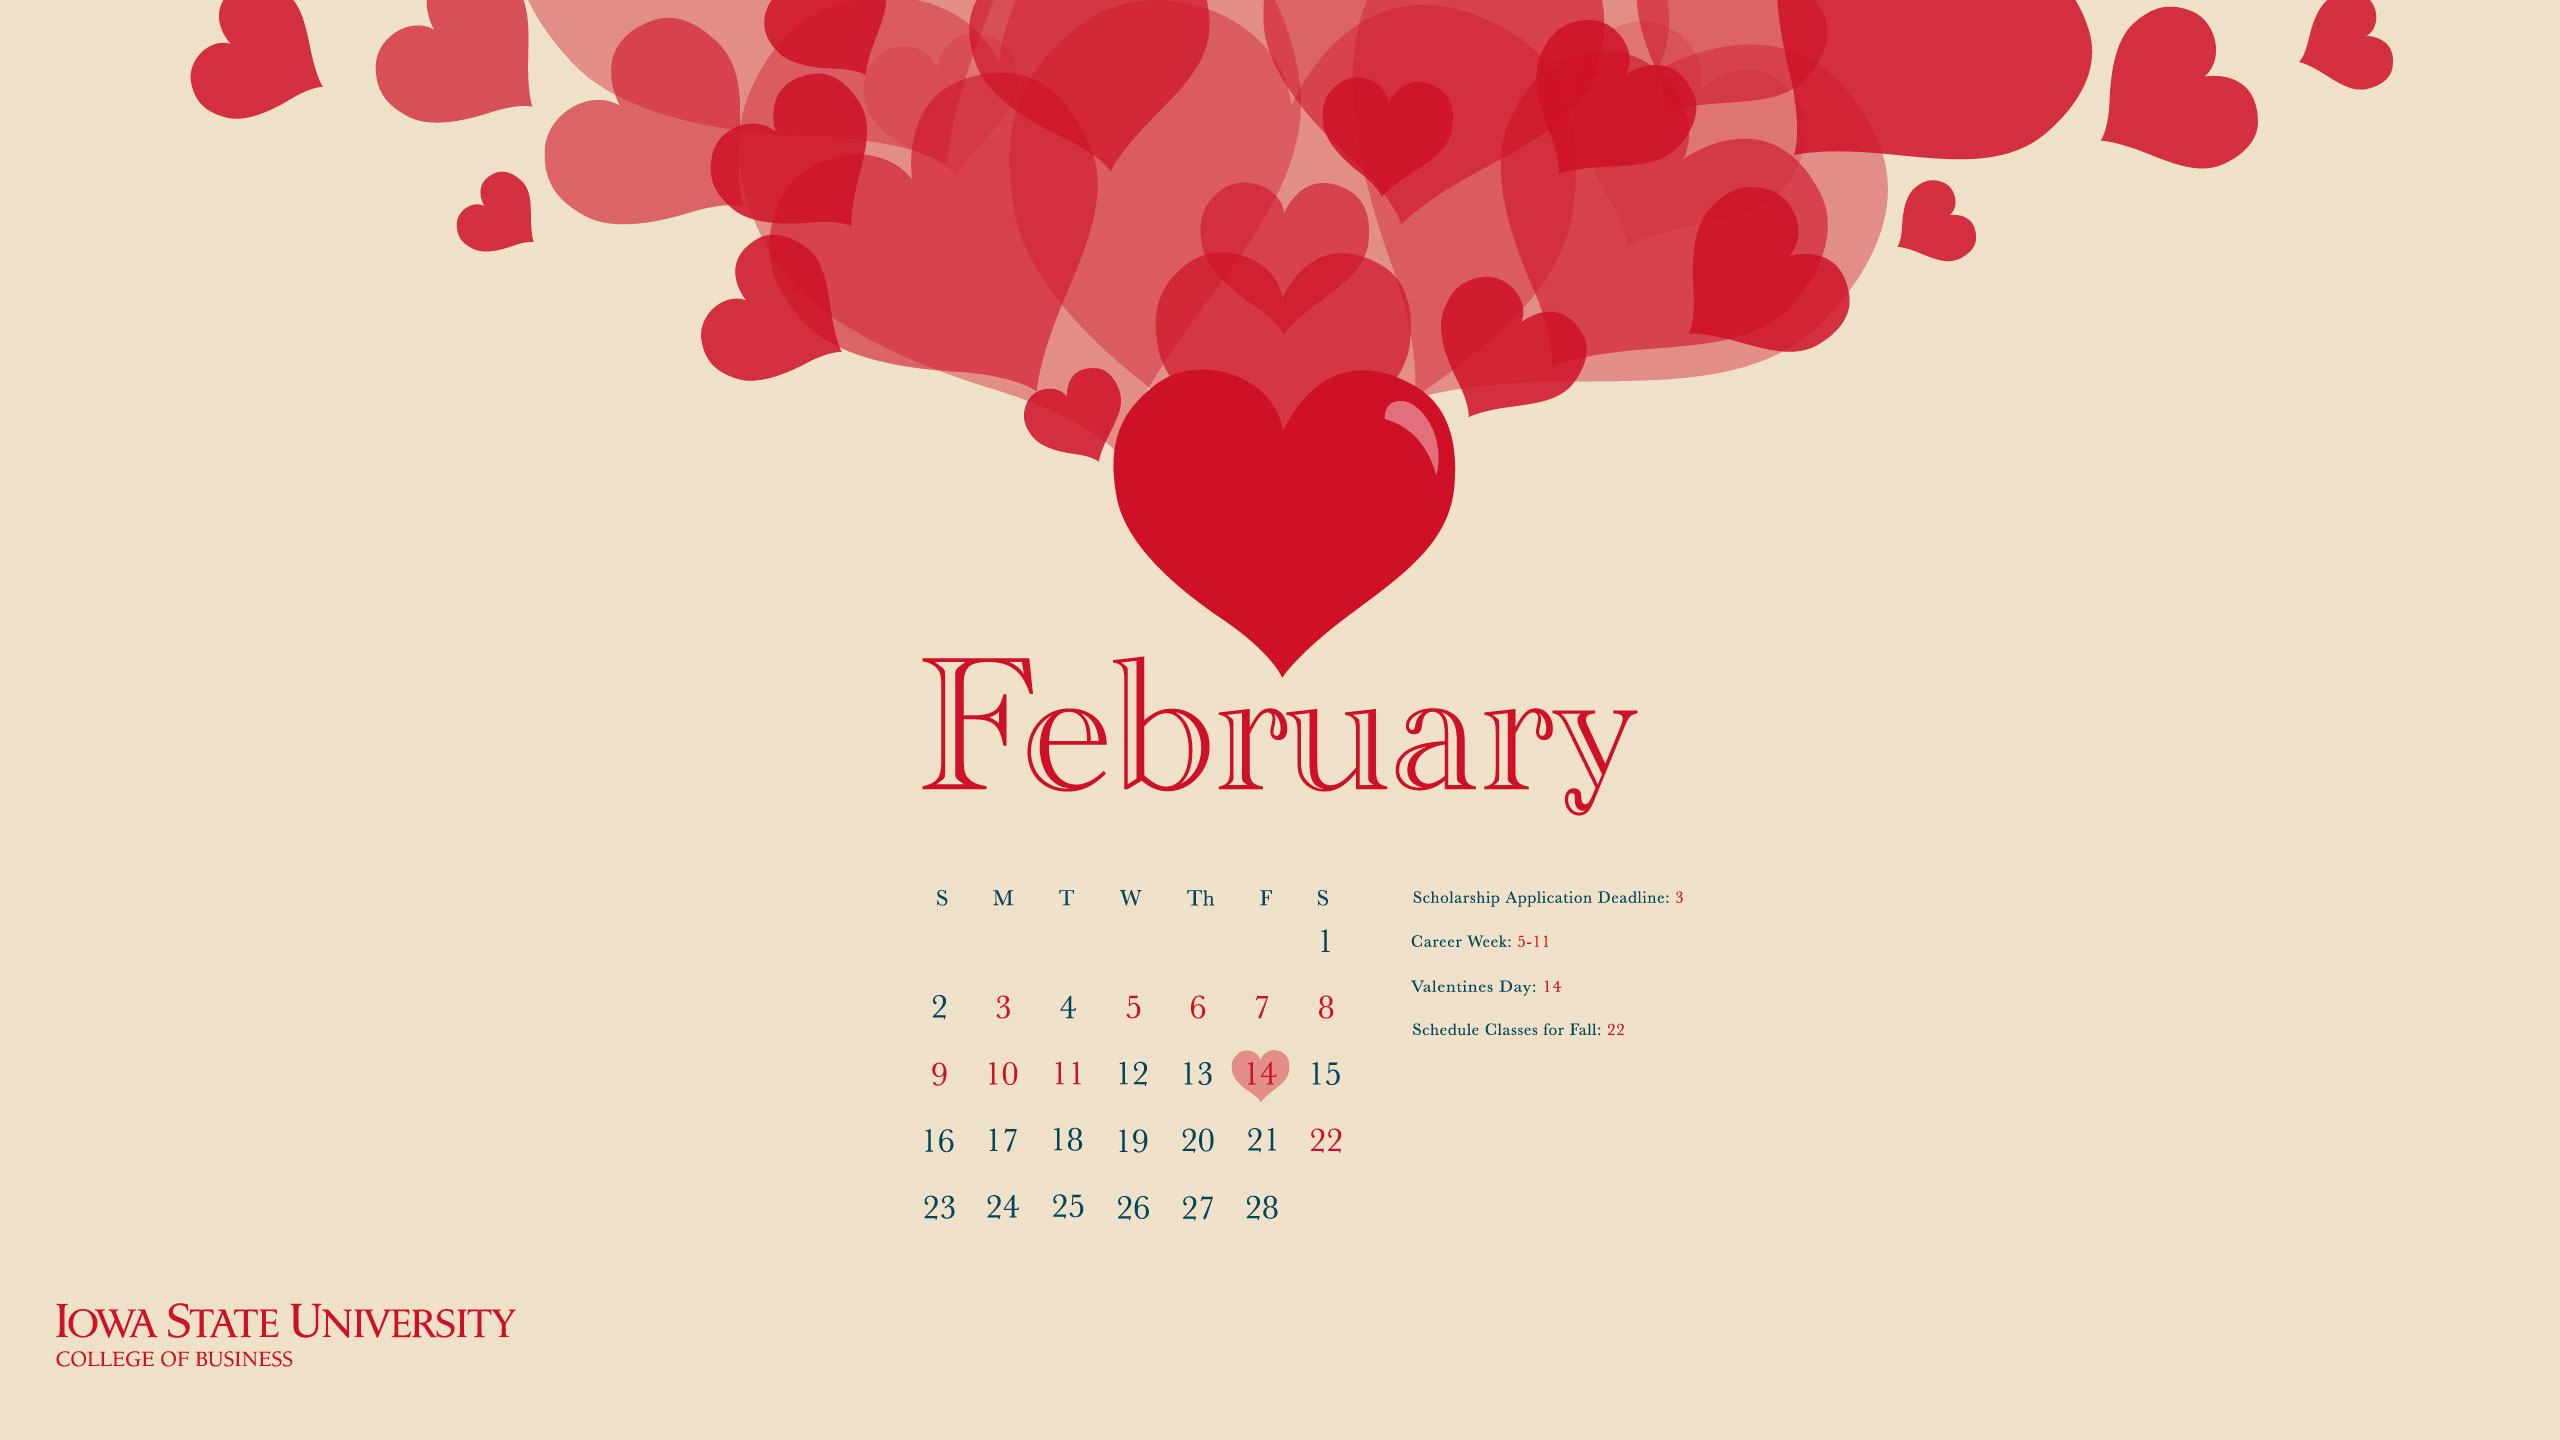 February 2014 Desktop Wallpaper 2560x1440